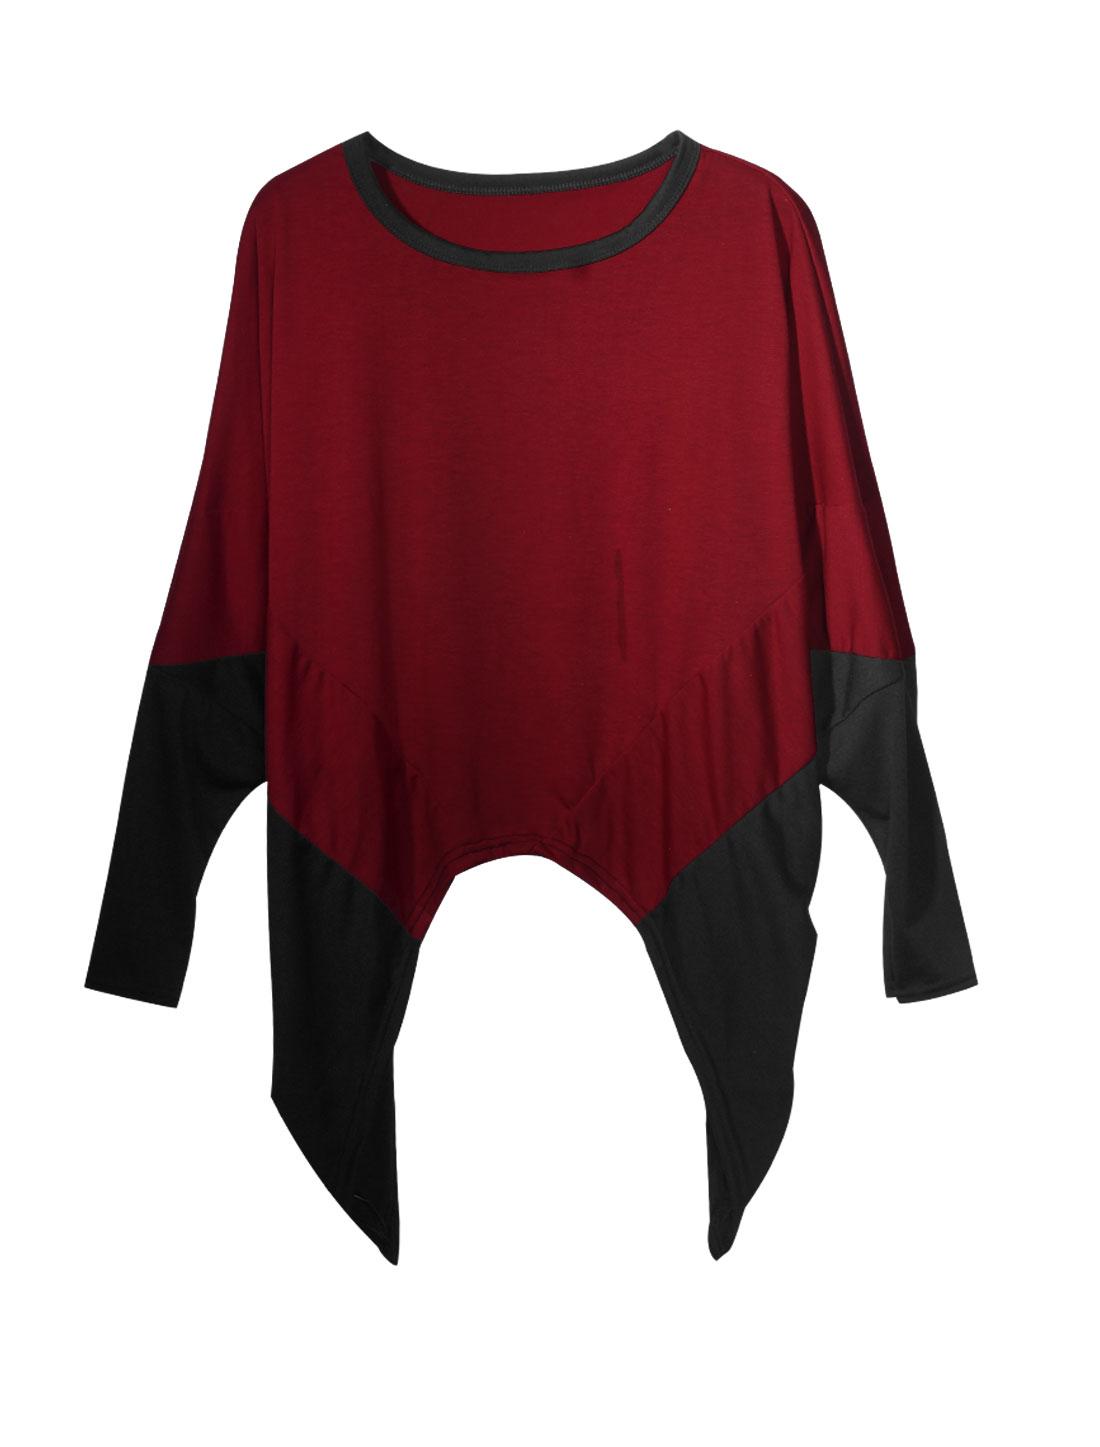 Lady Slipover Color Block Fashionable Leisure Blouse Burgundy Black XS